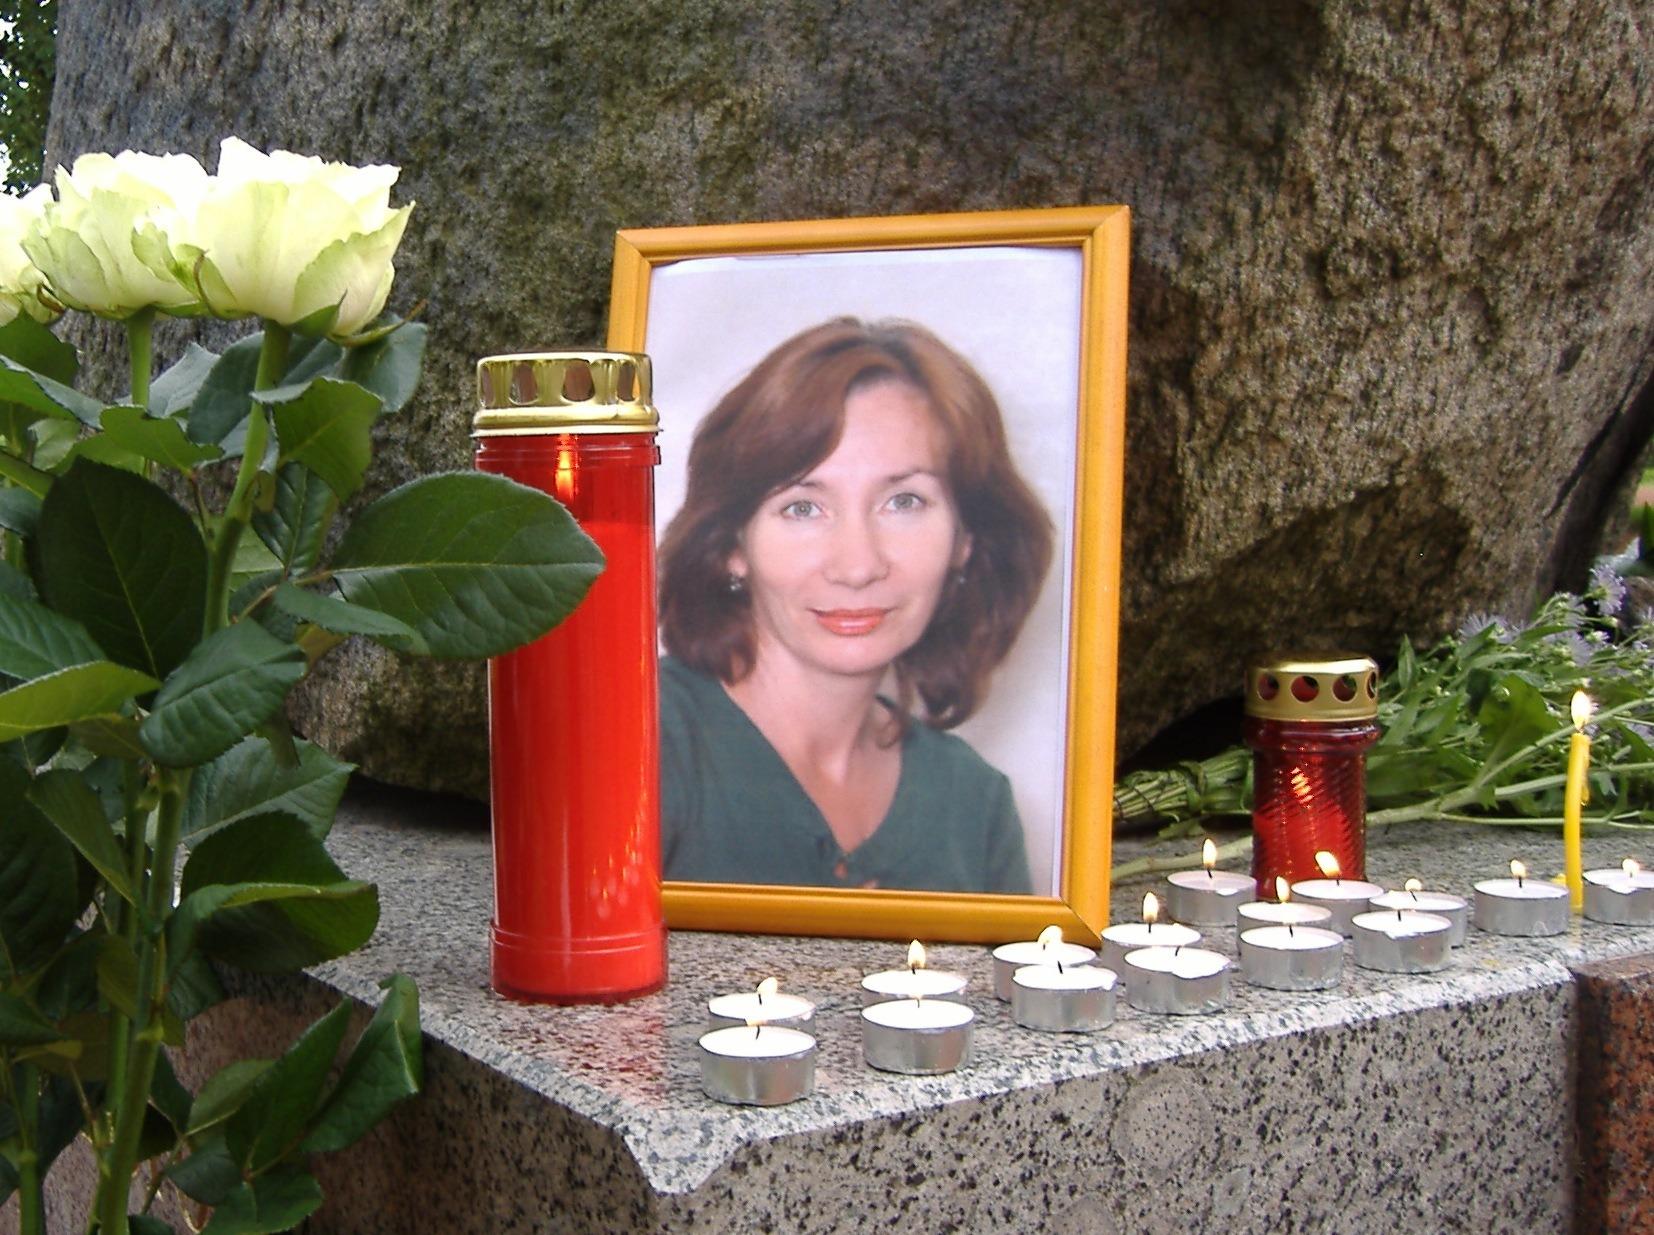 Remembering Natalia Estemirova